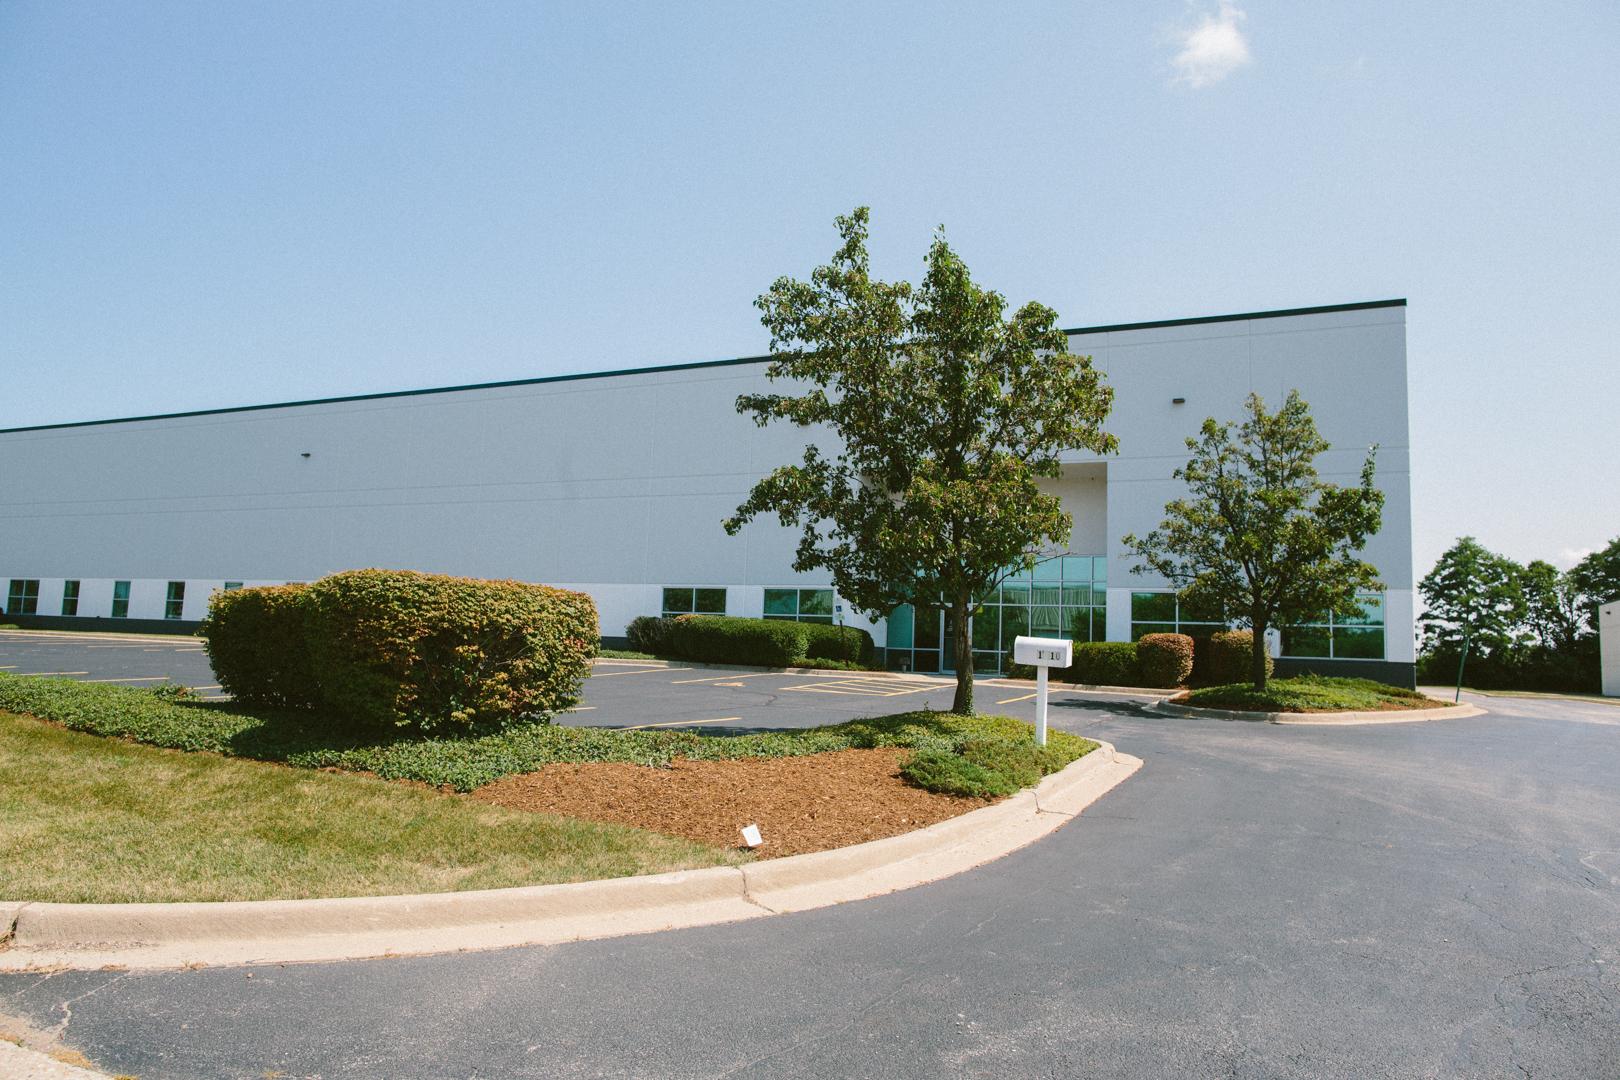 Illinois lake county wauconda - Industrial Real Estate In Lake County Illinois